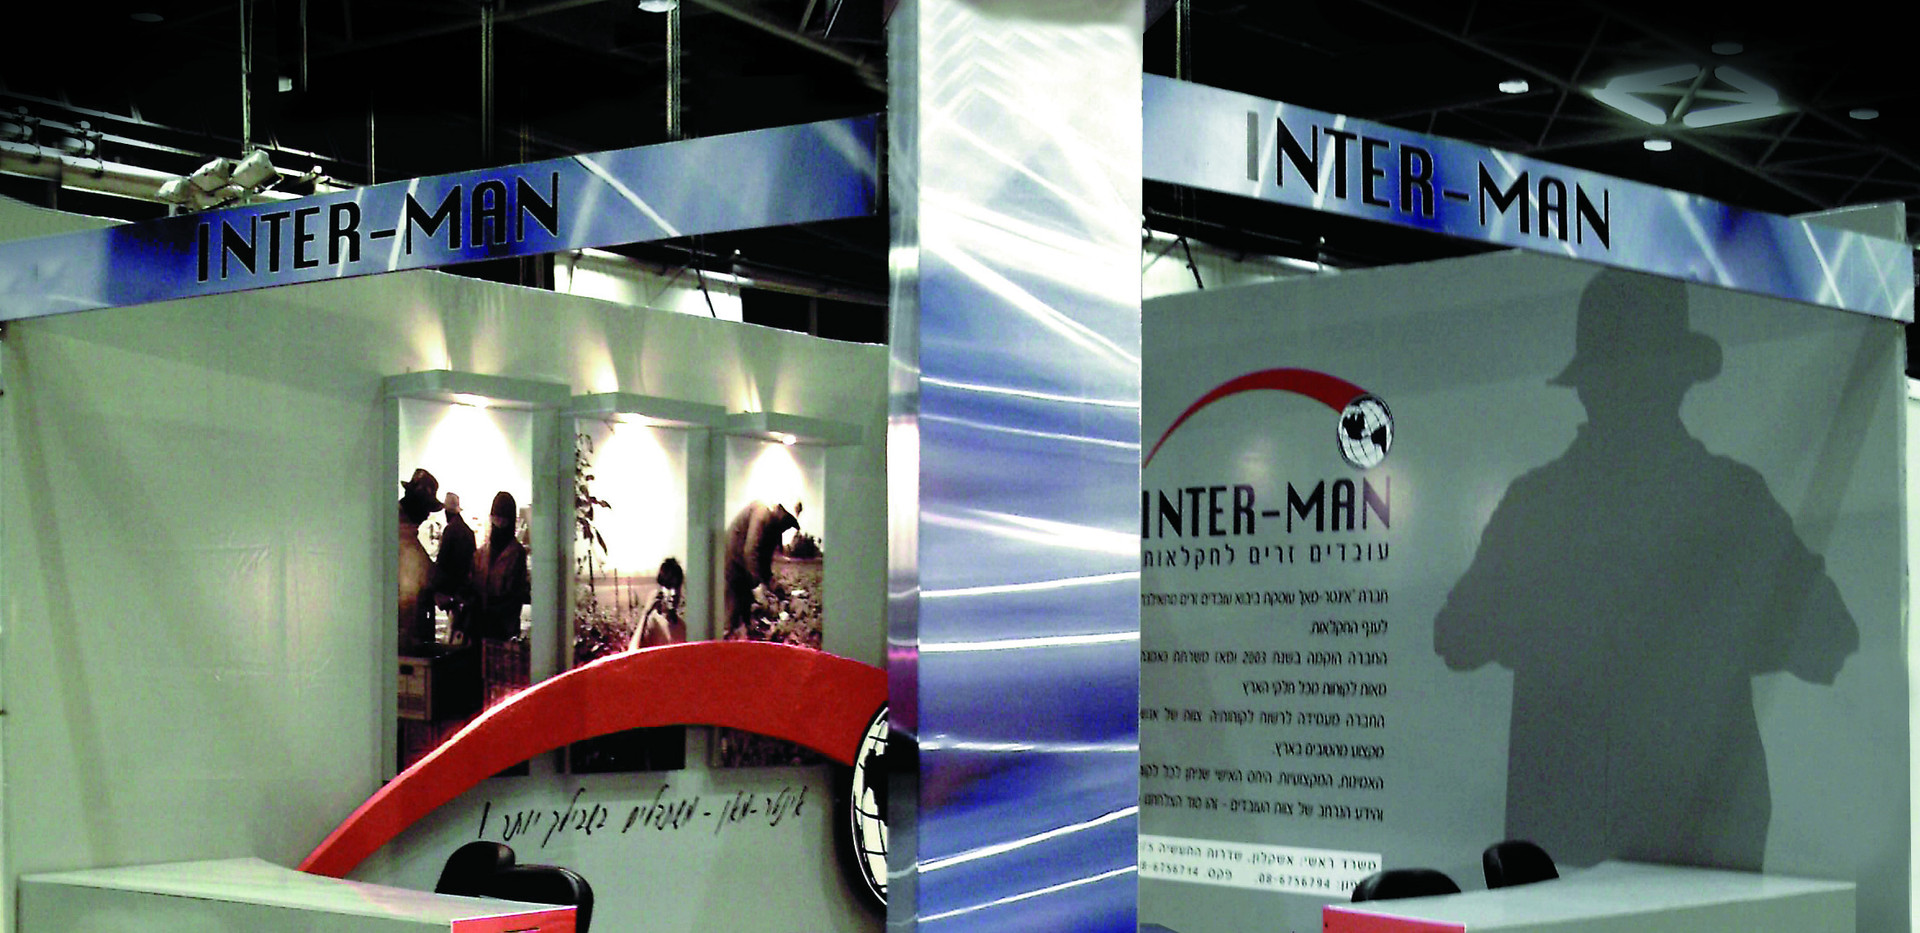 interman.jpg